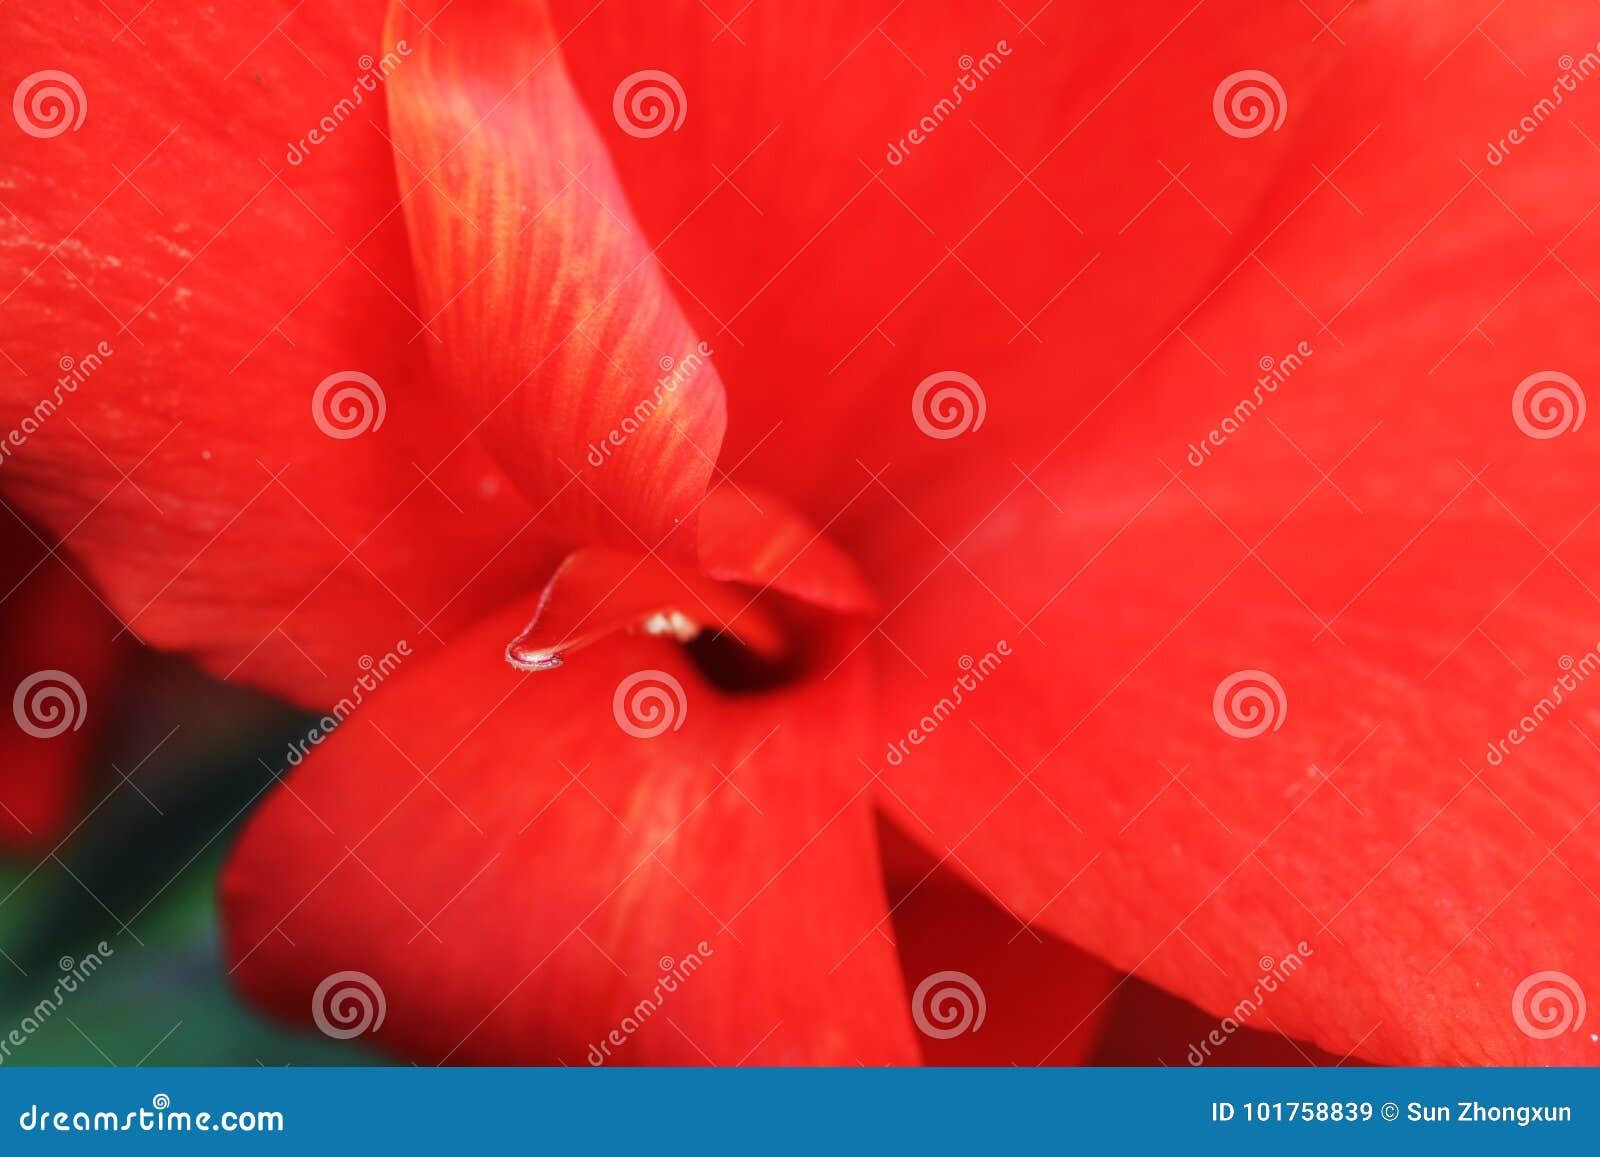 Iris stock image. Image of death, blue, called, metaphor - 101758839